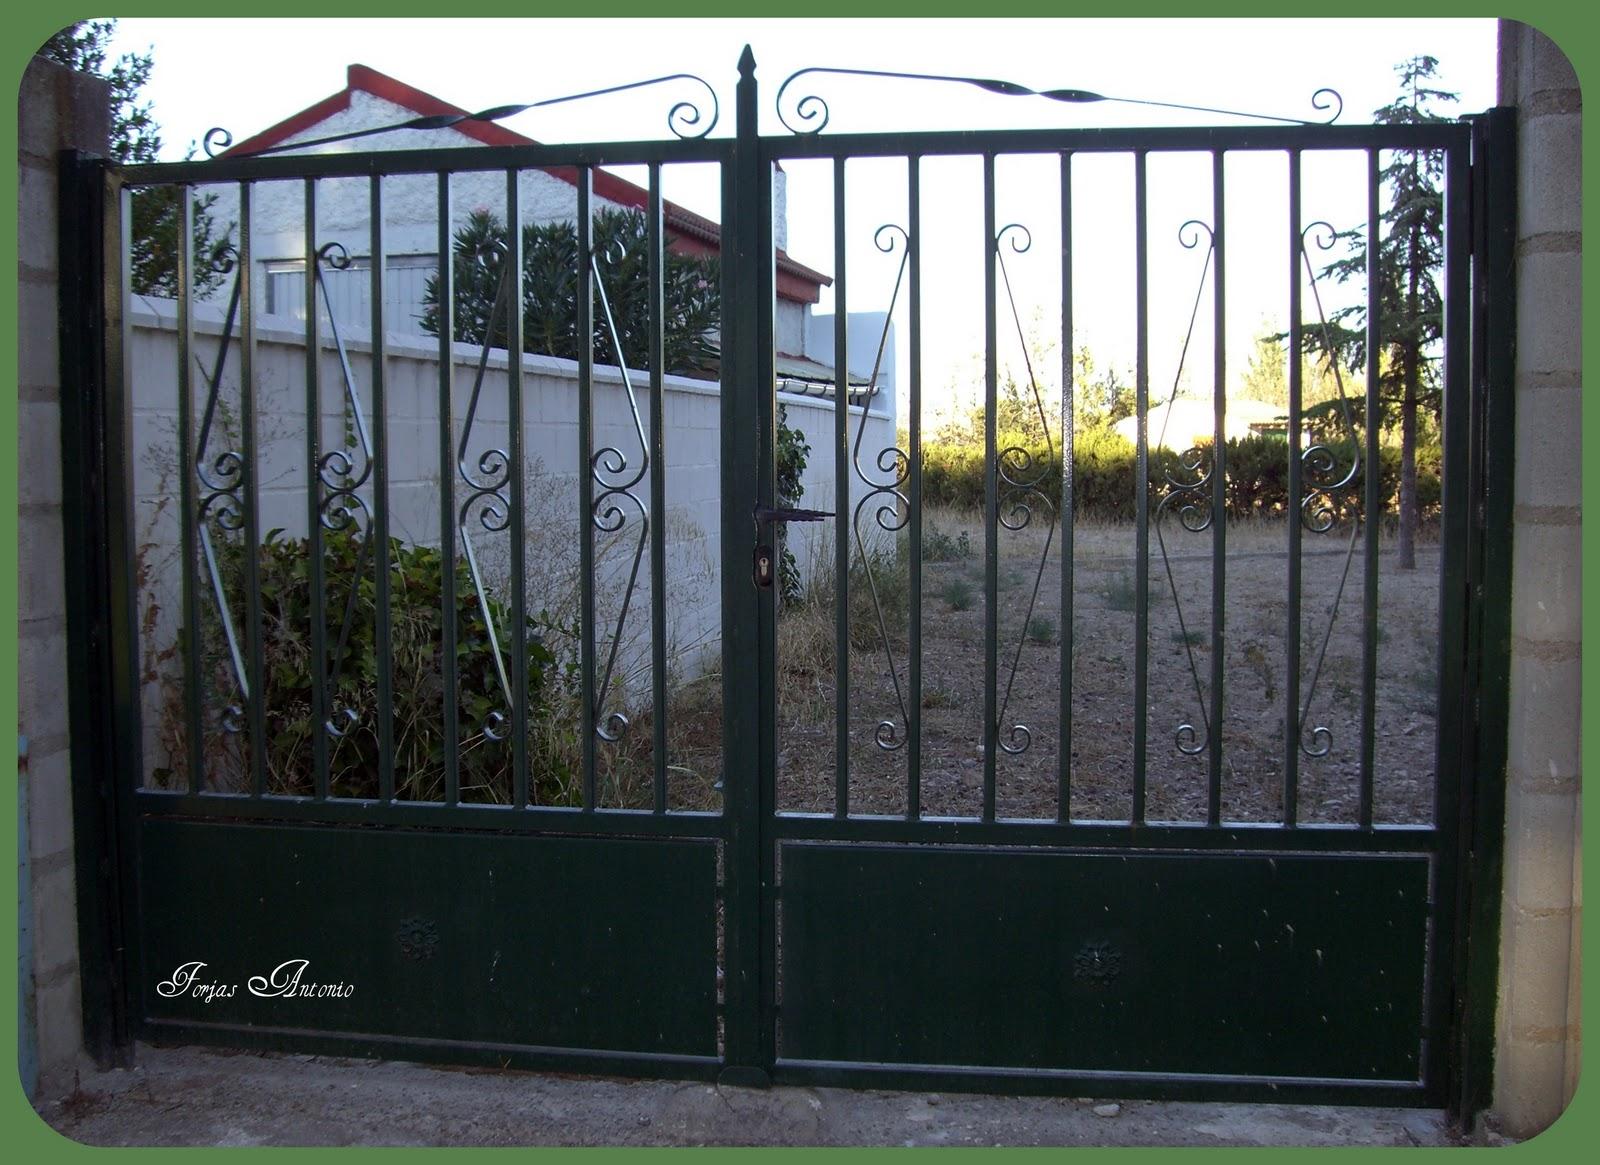 Puertas de jardin dise os arquitect nicos for Puertas para jardin baratas